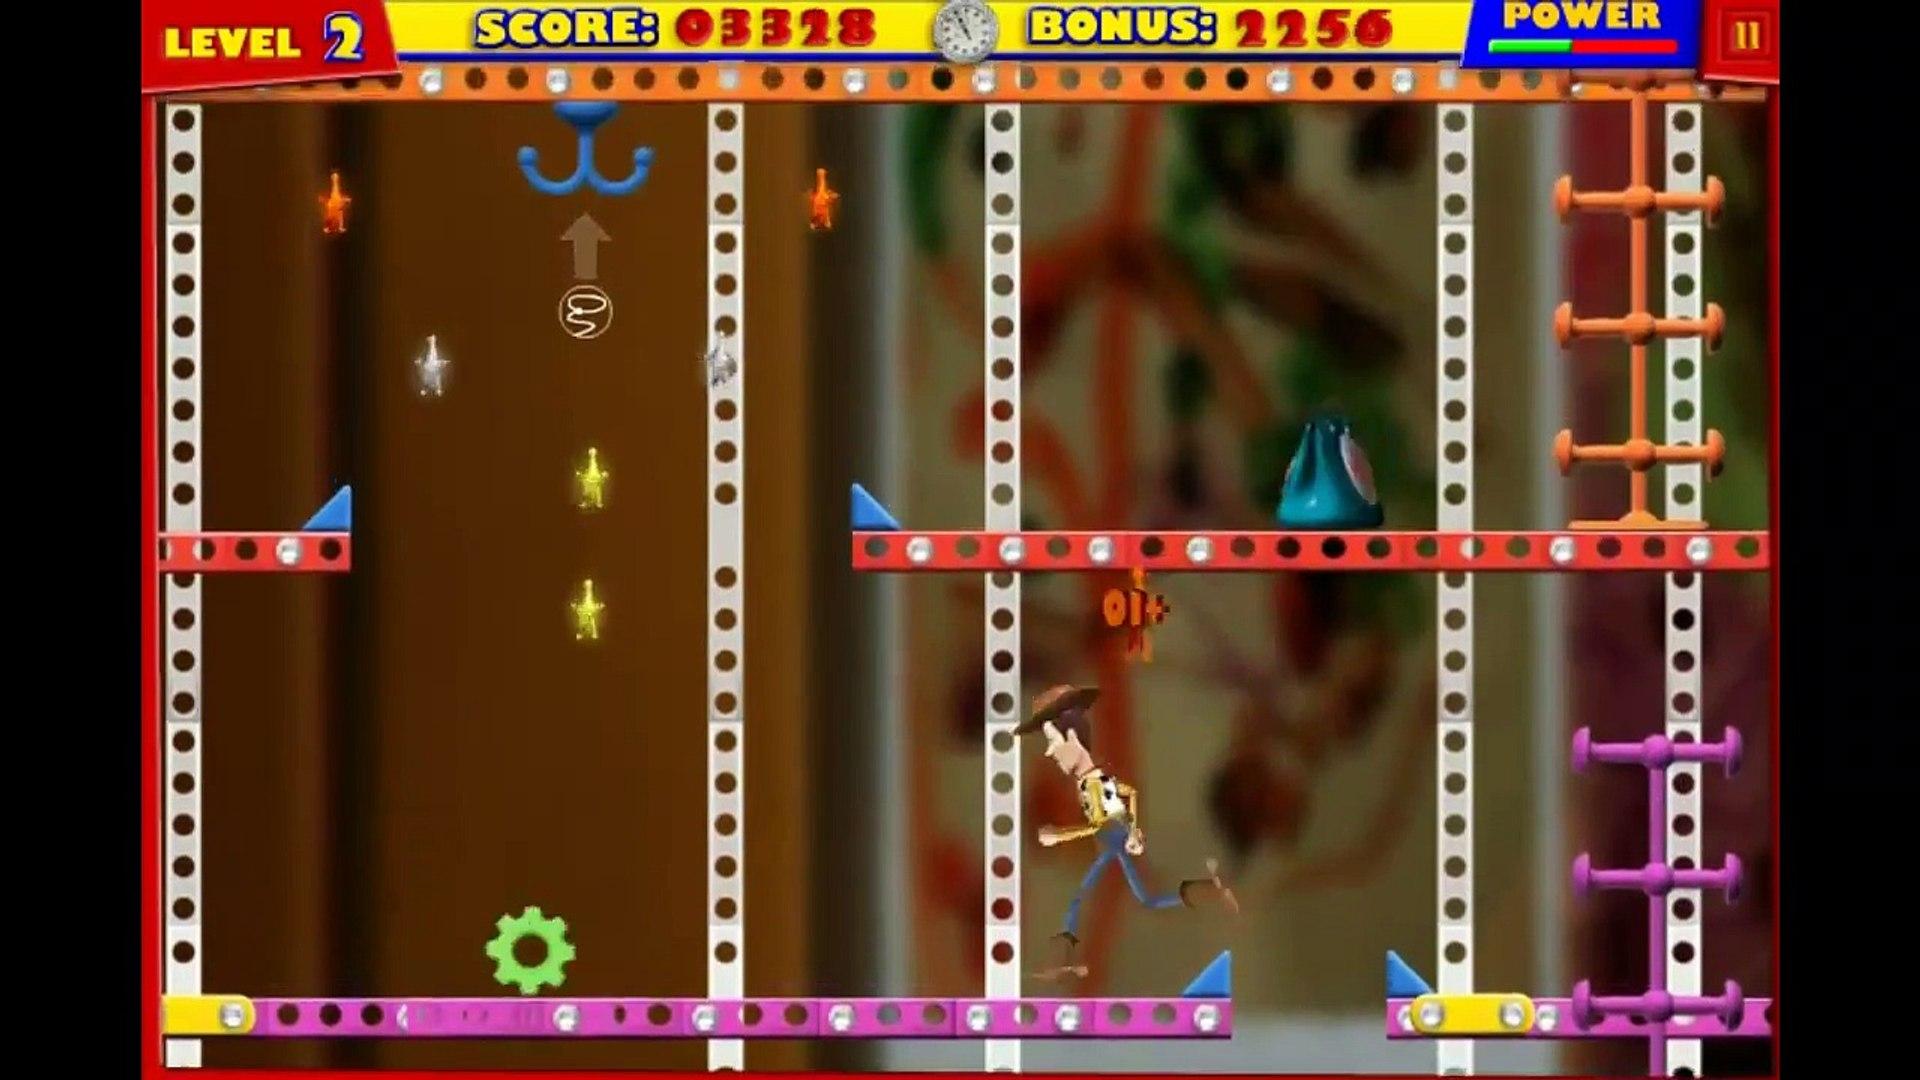 Toy Story Woodys Wild Adventure Game - Toy Story Movie Series - Disney Pixar Animation